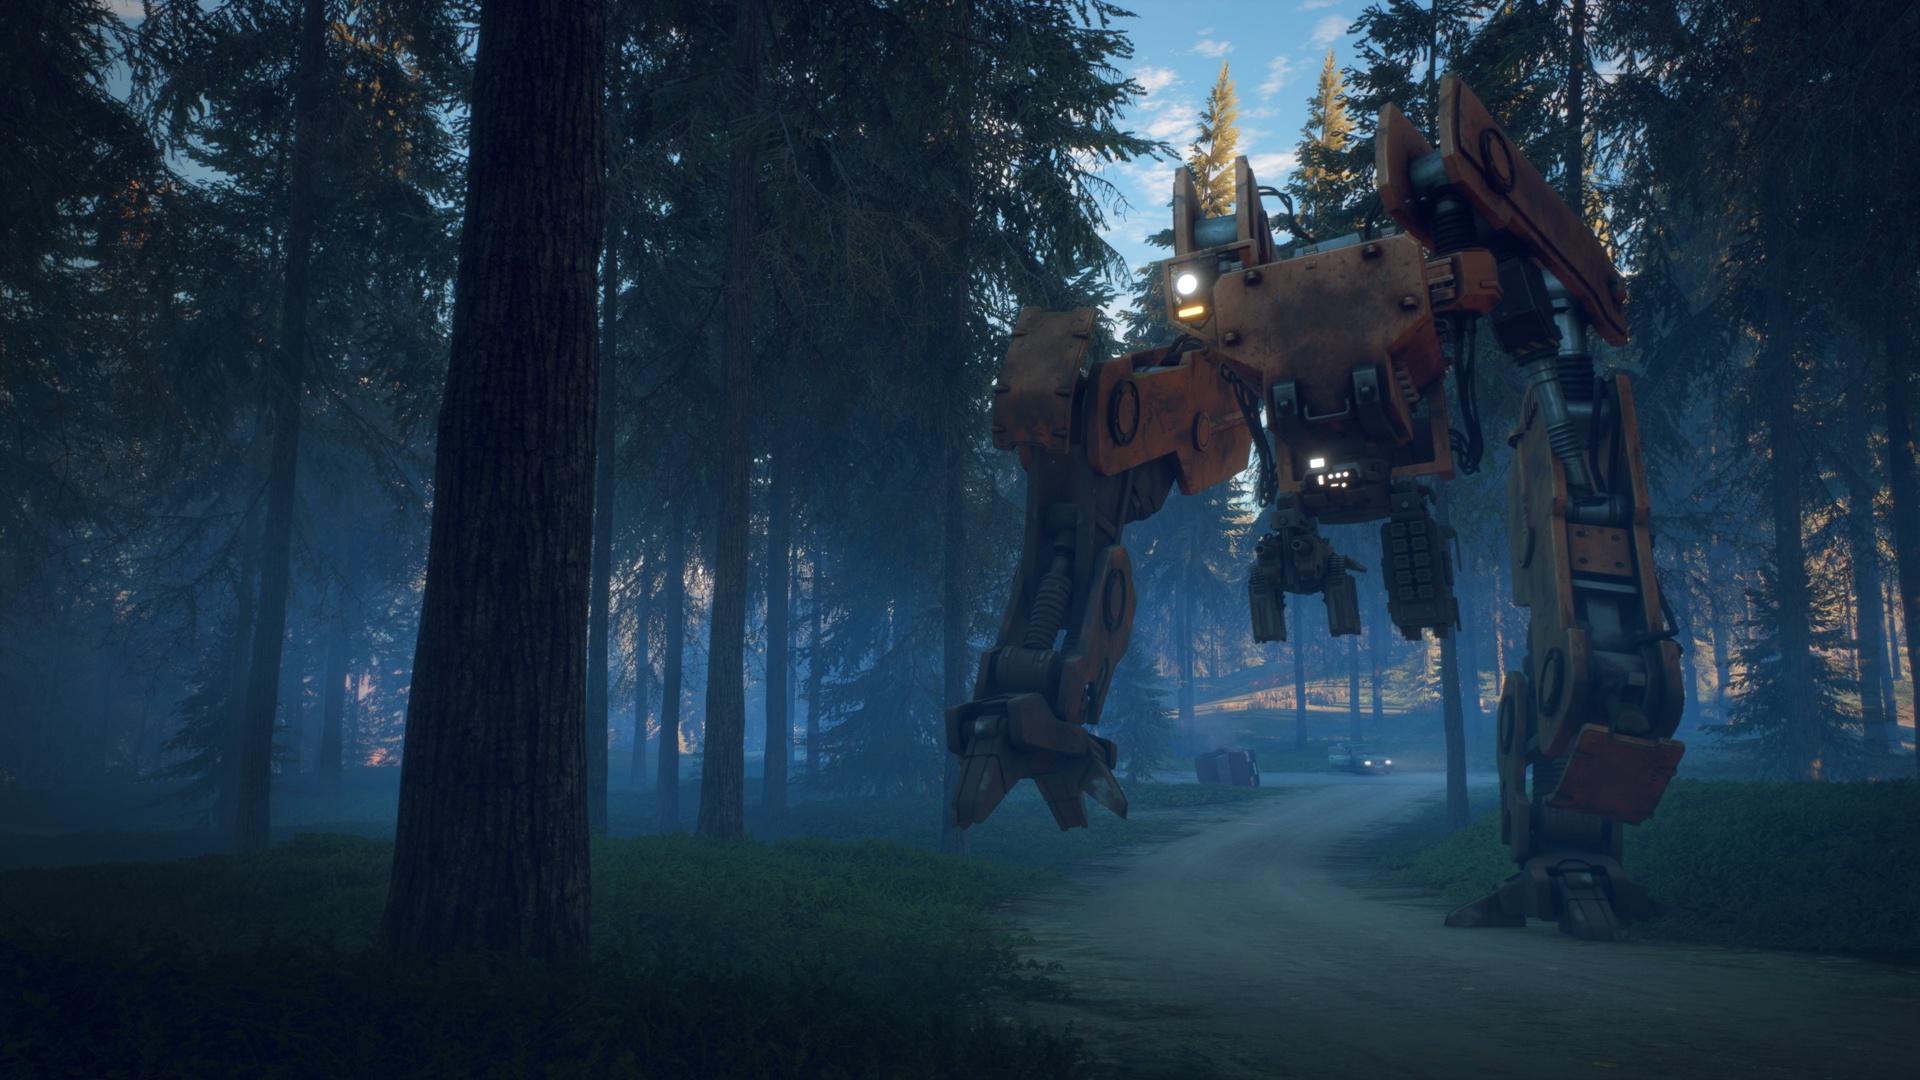 Battlefield 4 Wallpaper Hd One Swedish Artist Is Understandably Upset That Generation